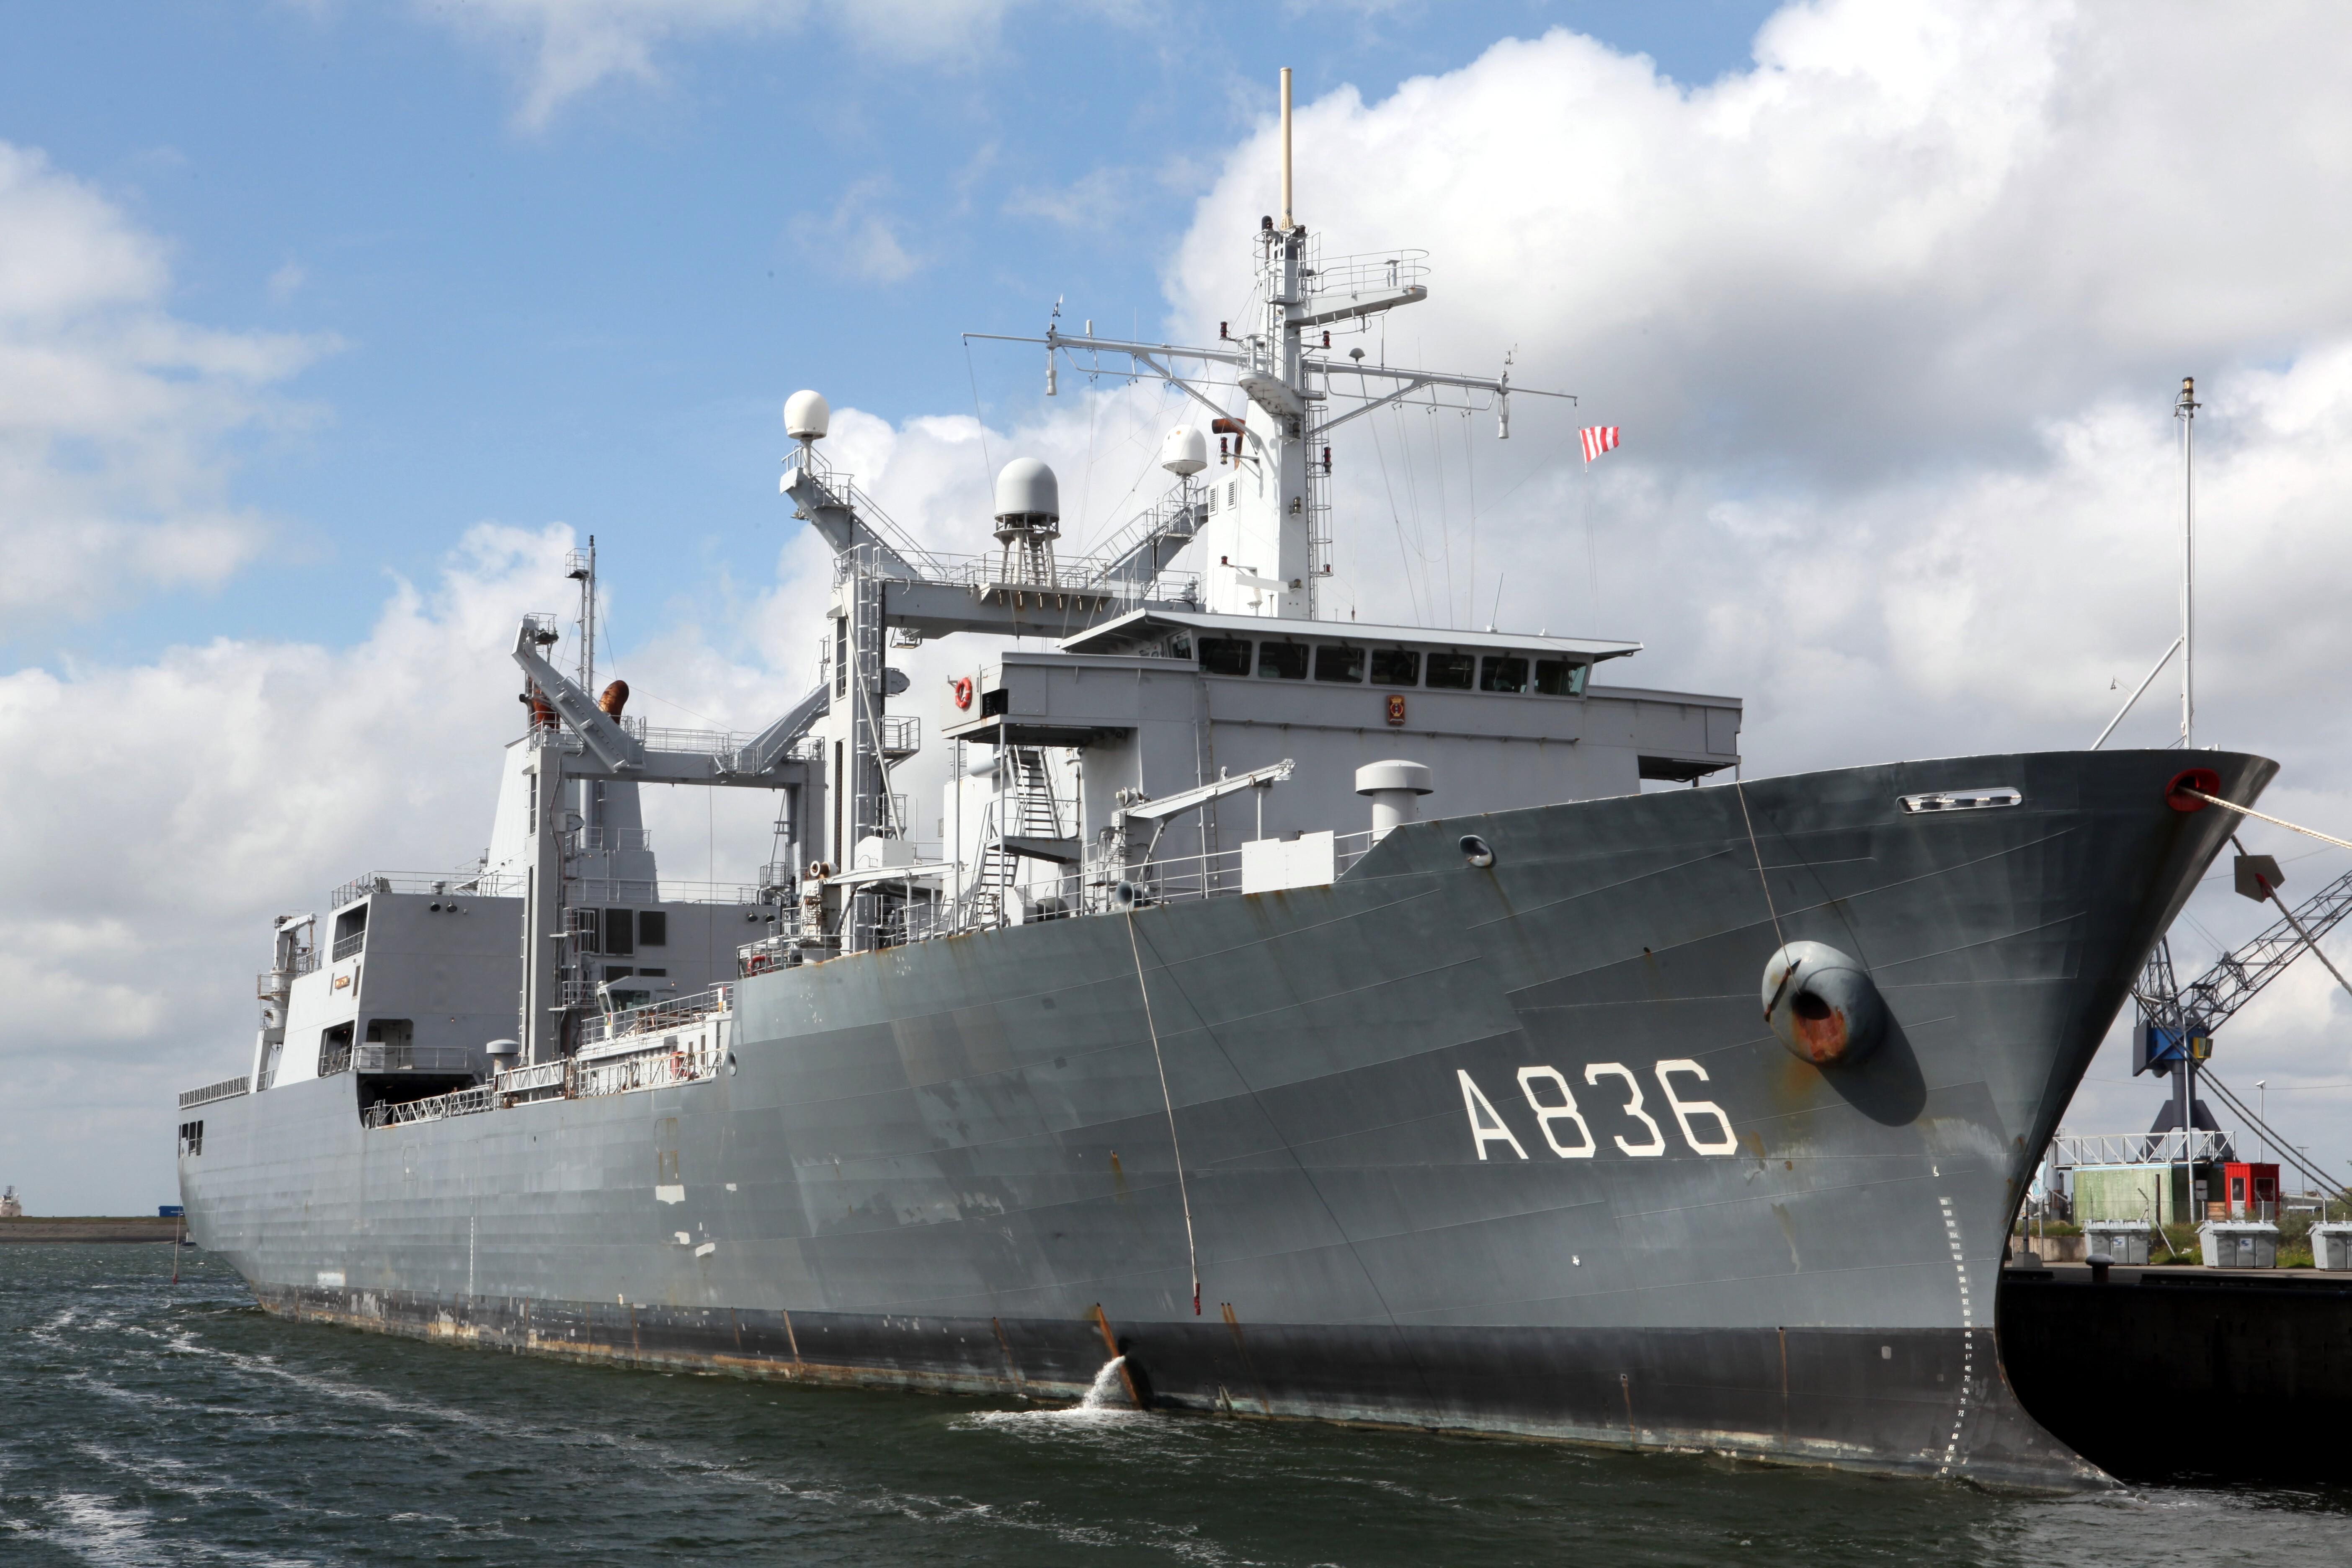 File:HNLMS Amsterdam A 836 (1).jpg